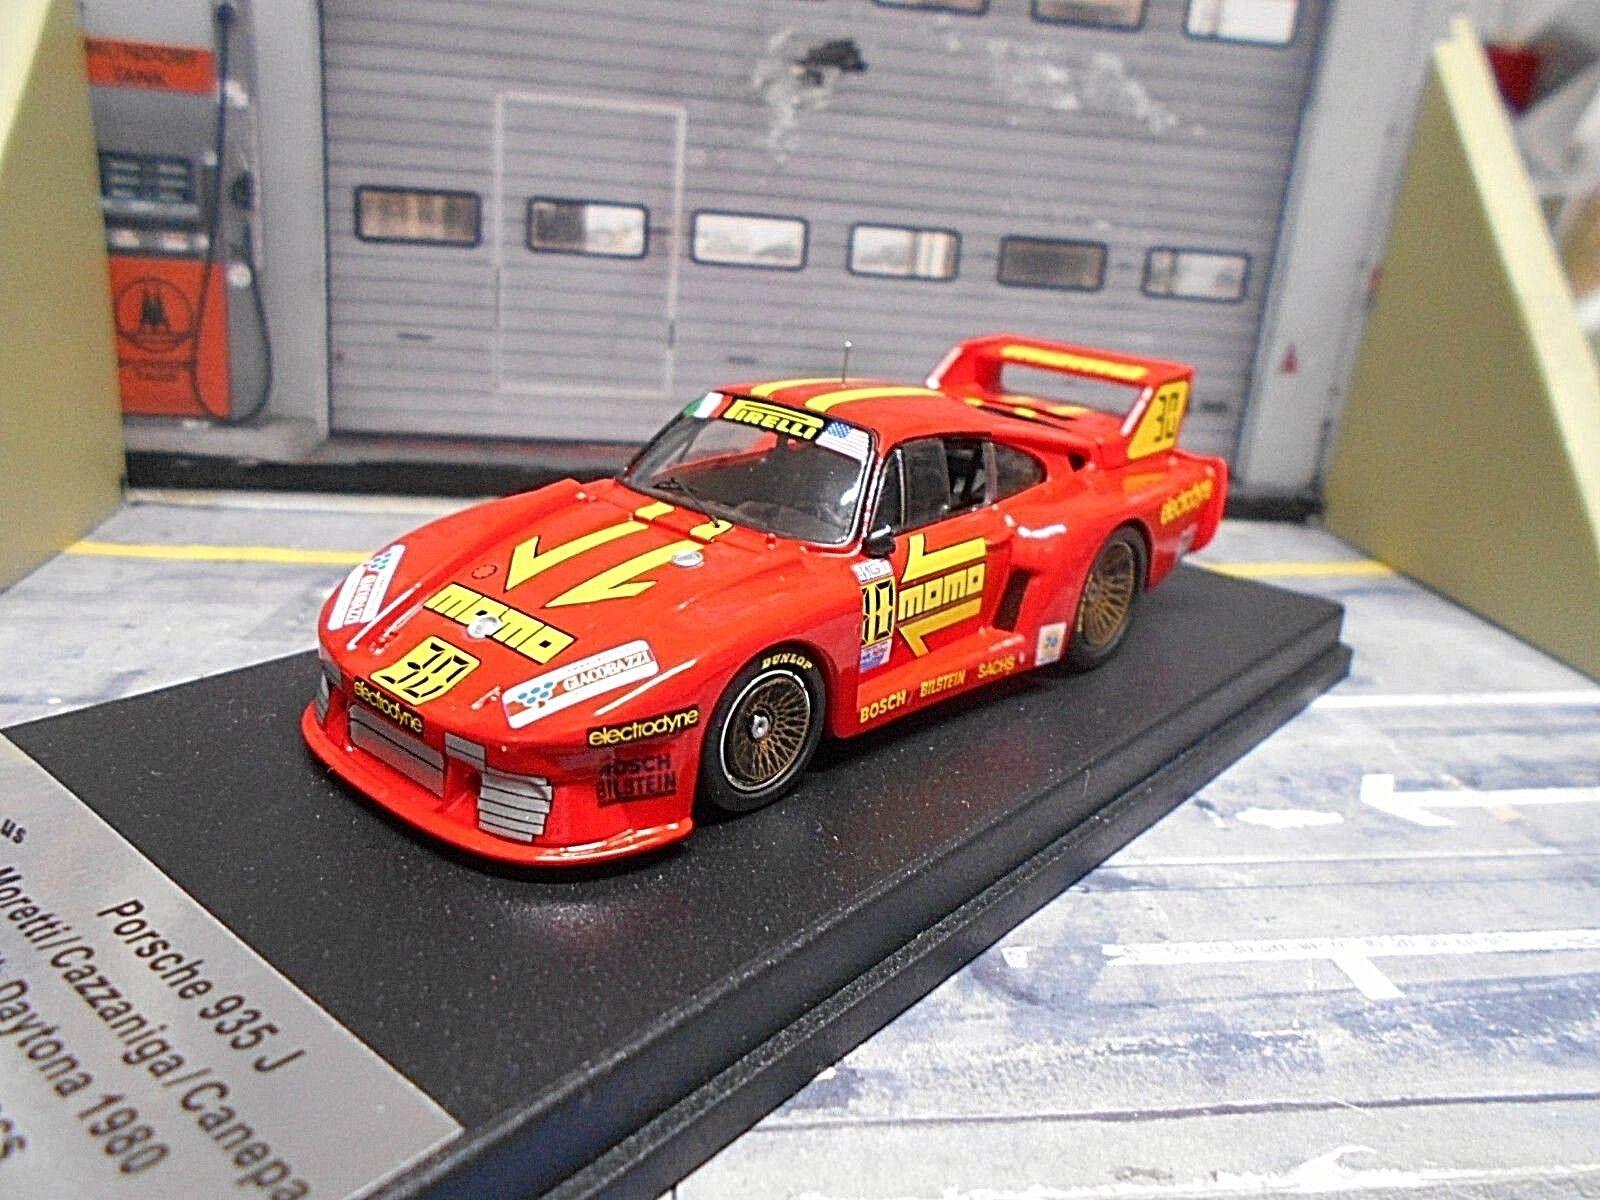 PORSCHE 935 Turbo  80 24h Daytona Momo 24h Daytona 80 Moretti Canep Trofeu 1 43  | Zu einem niedrigeren Preis